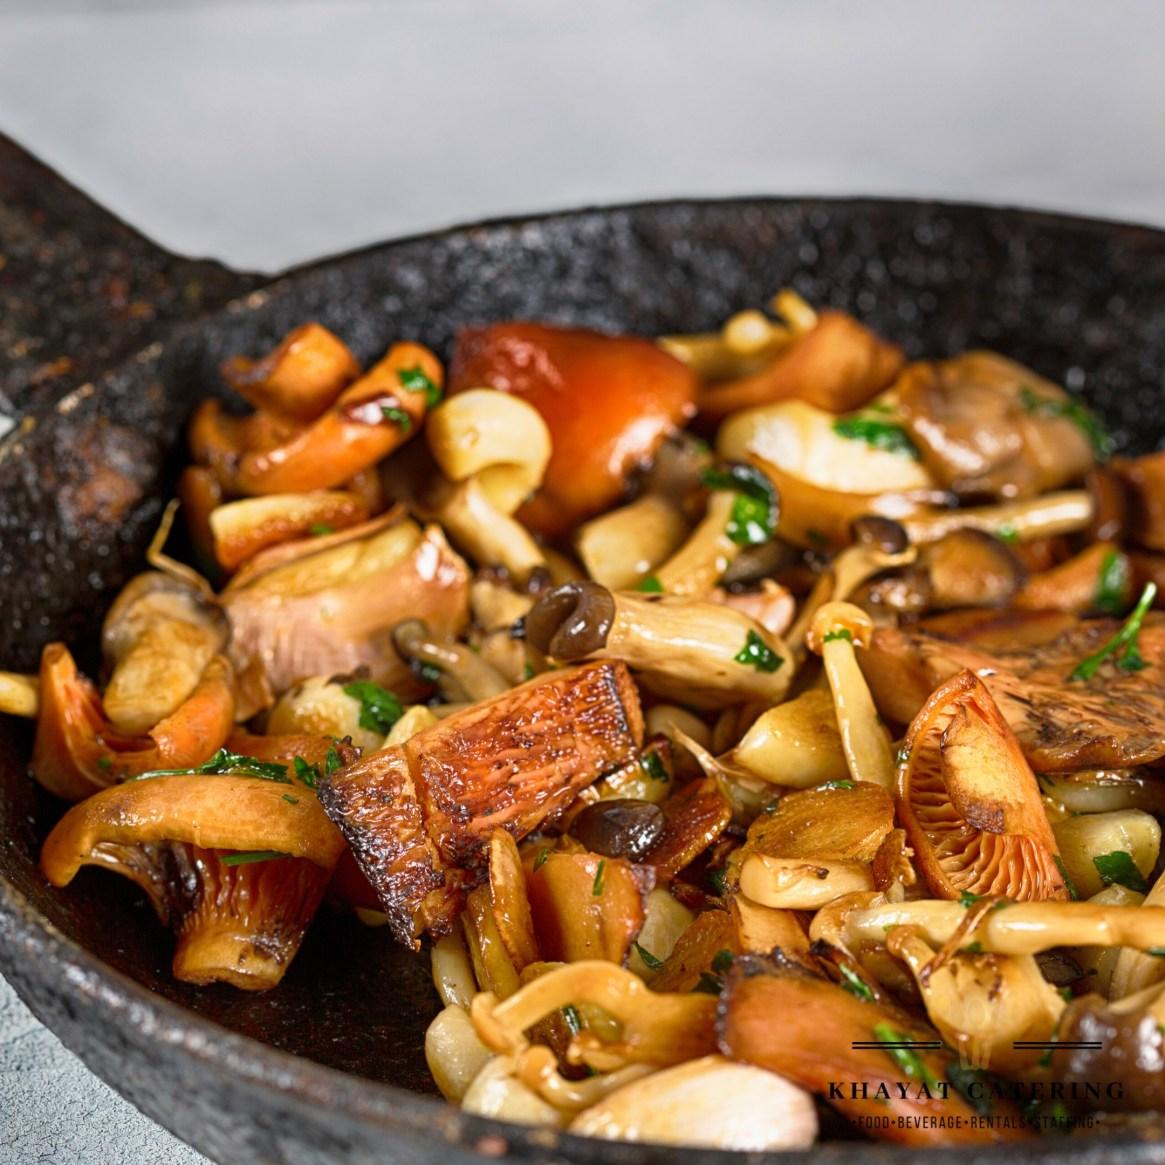 Khayat Catering roasted wild mushrooms